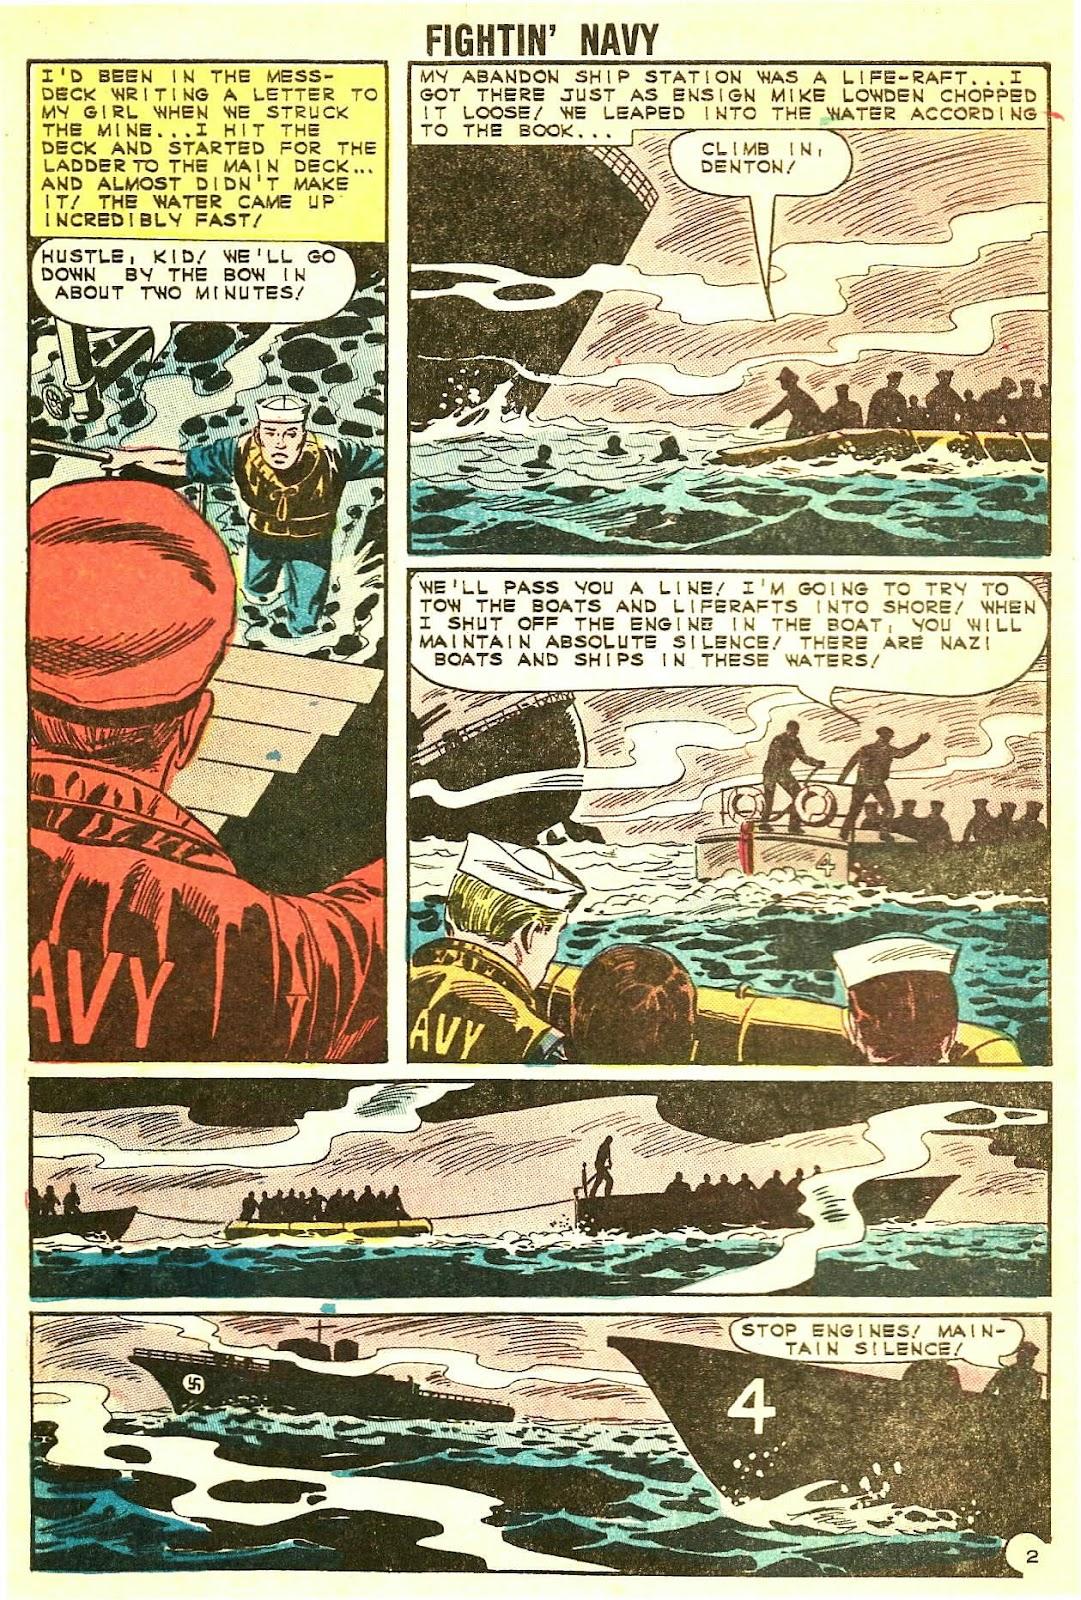 Read online Fightin' Navy comic -  Issue #115 - 4